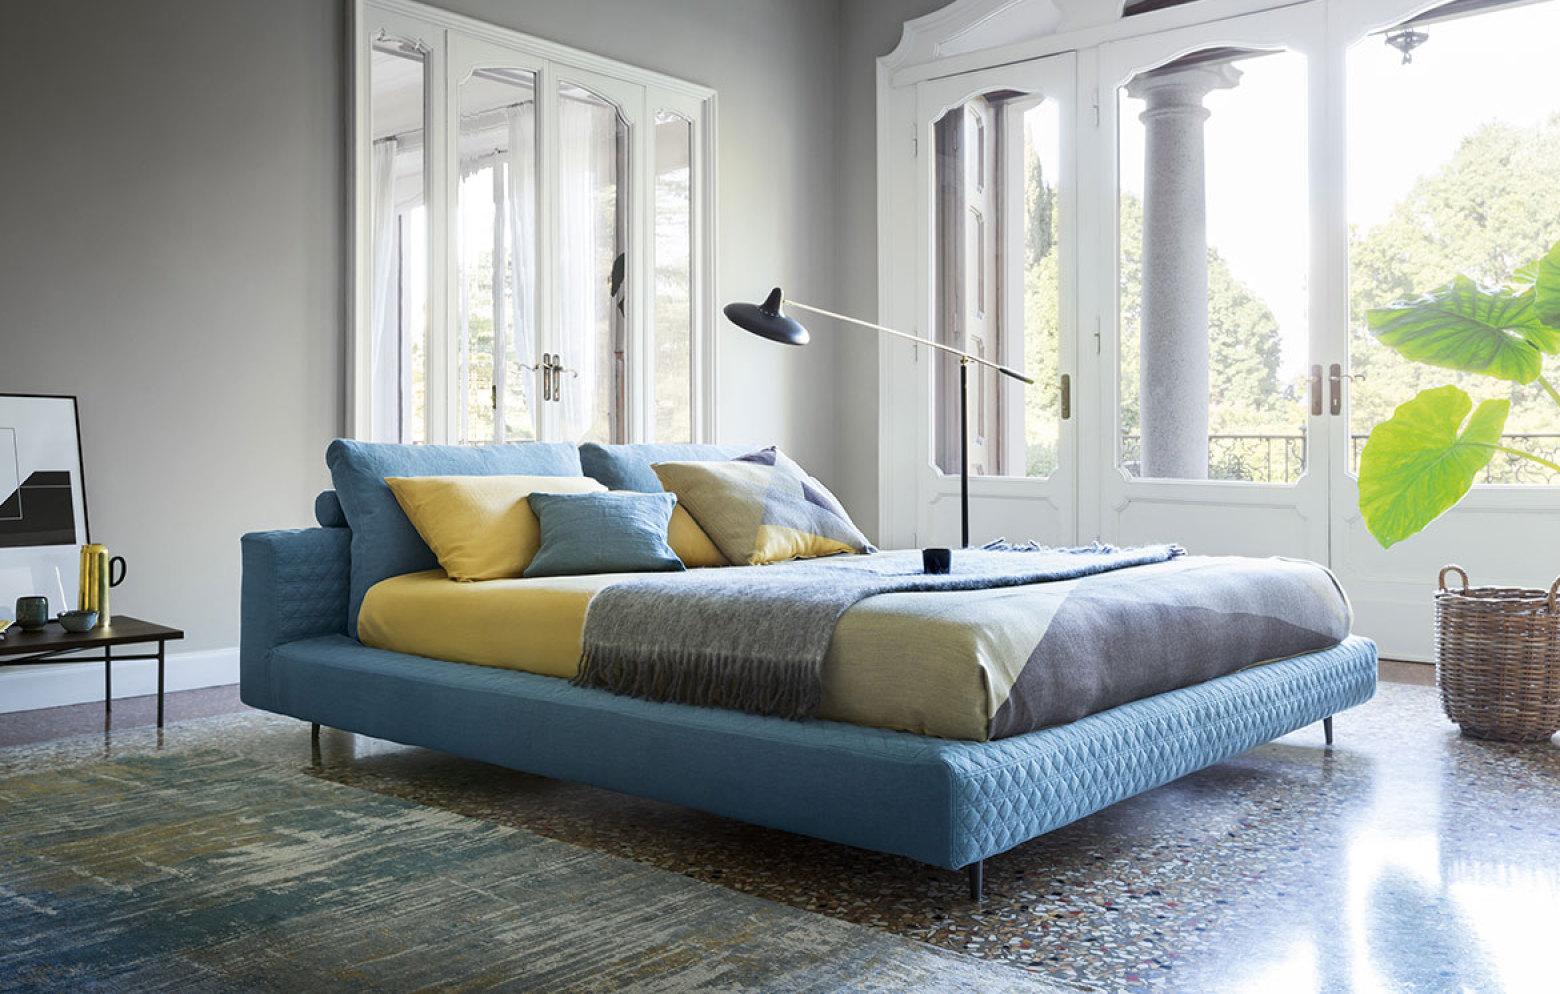 owen ego betten betten schr nke who 39 s perfect. Black Bedroom Furniture Sets. Home Design Ideas